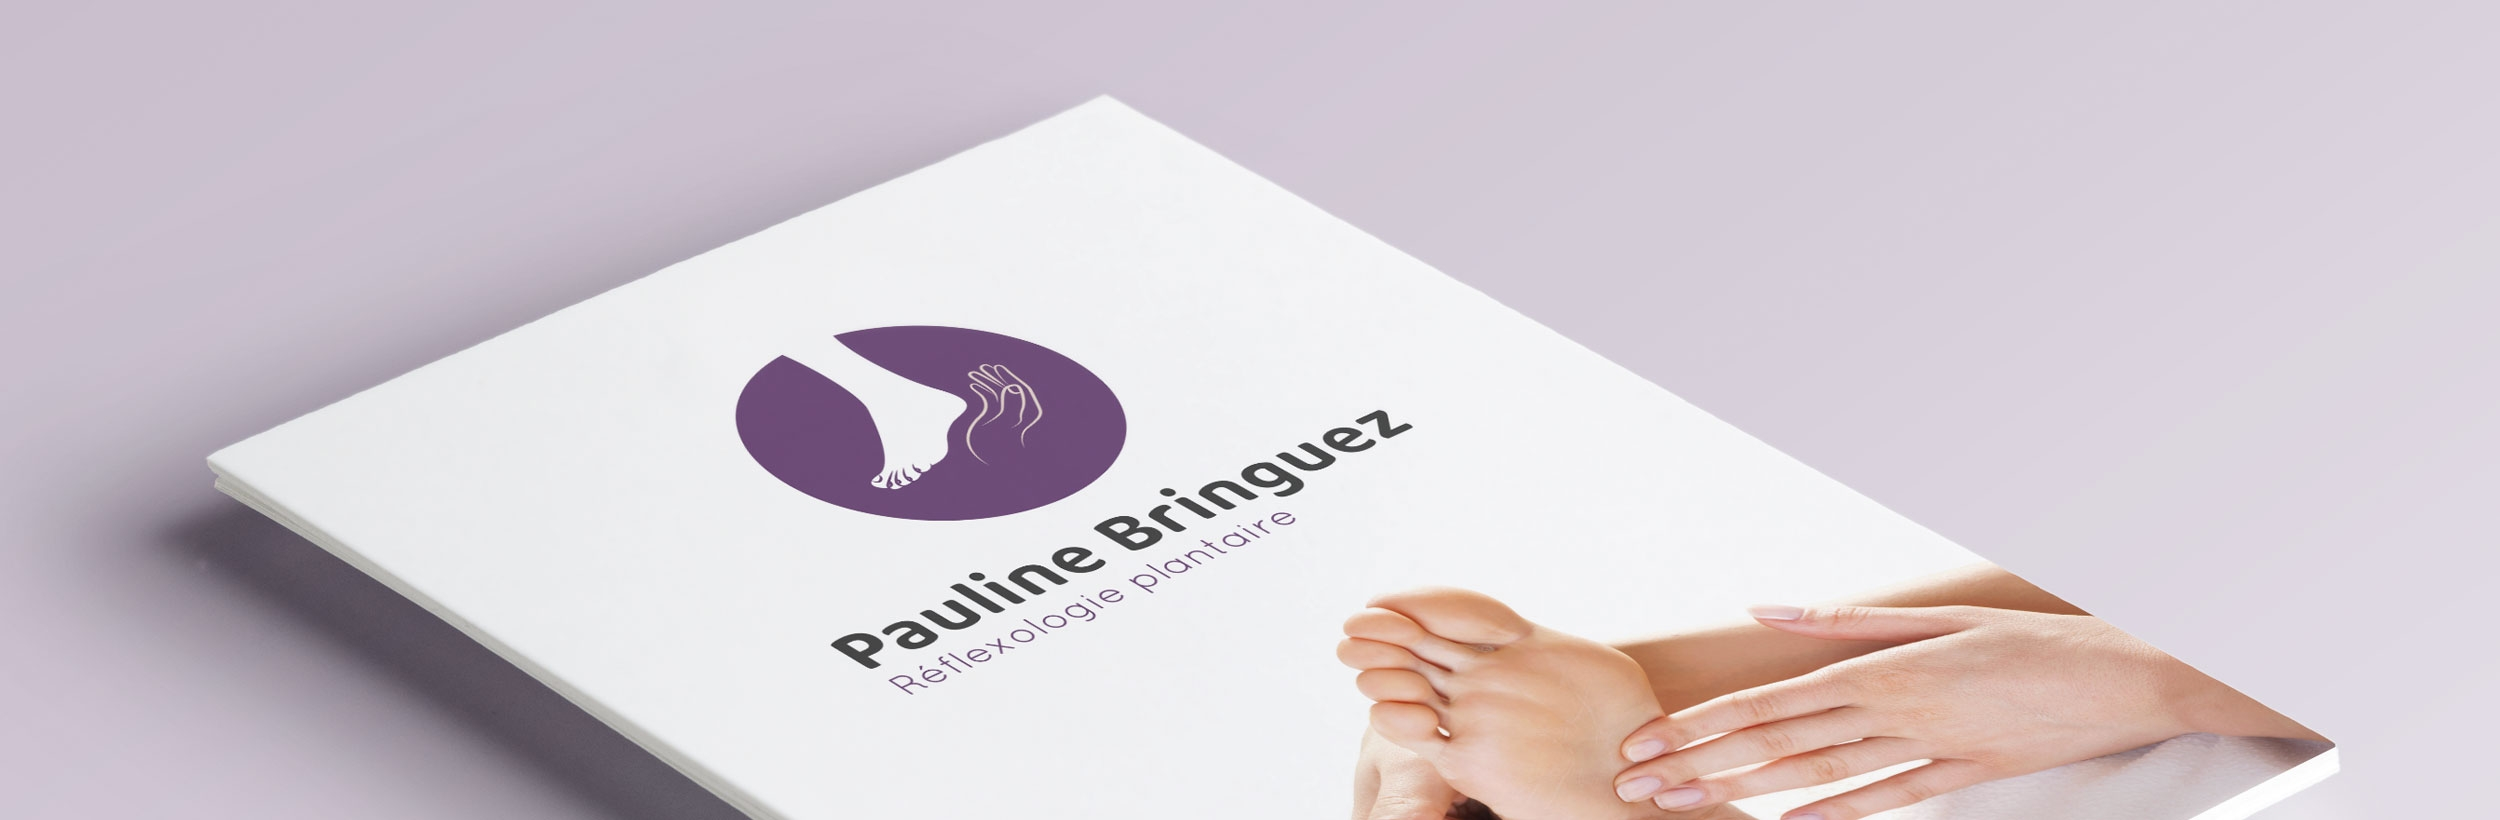 professionnels-print-supports-com-pbreflexo-pagetop